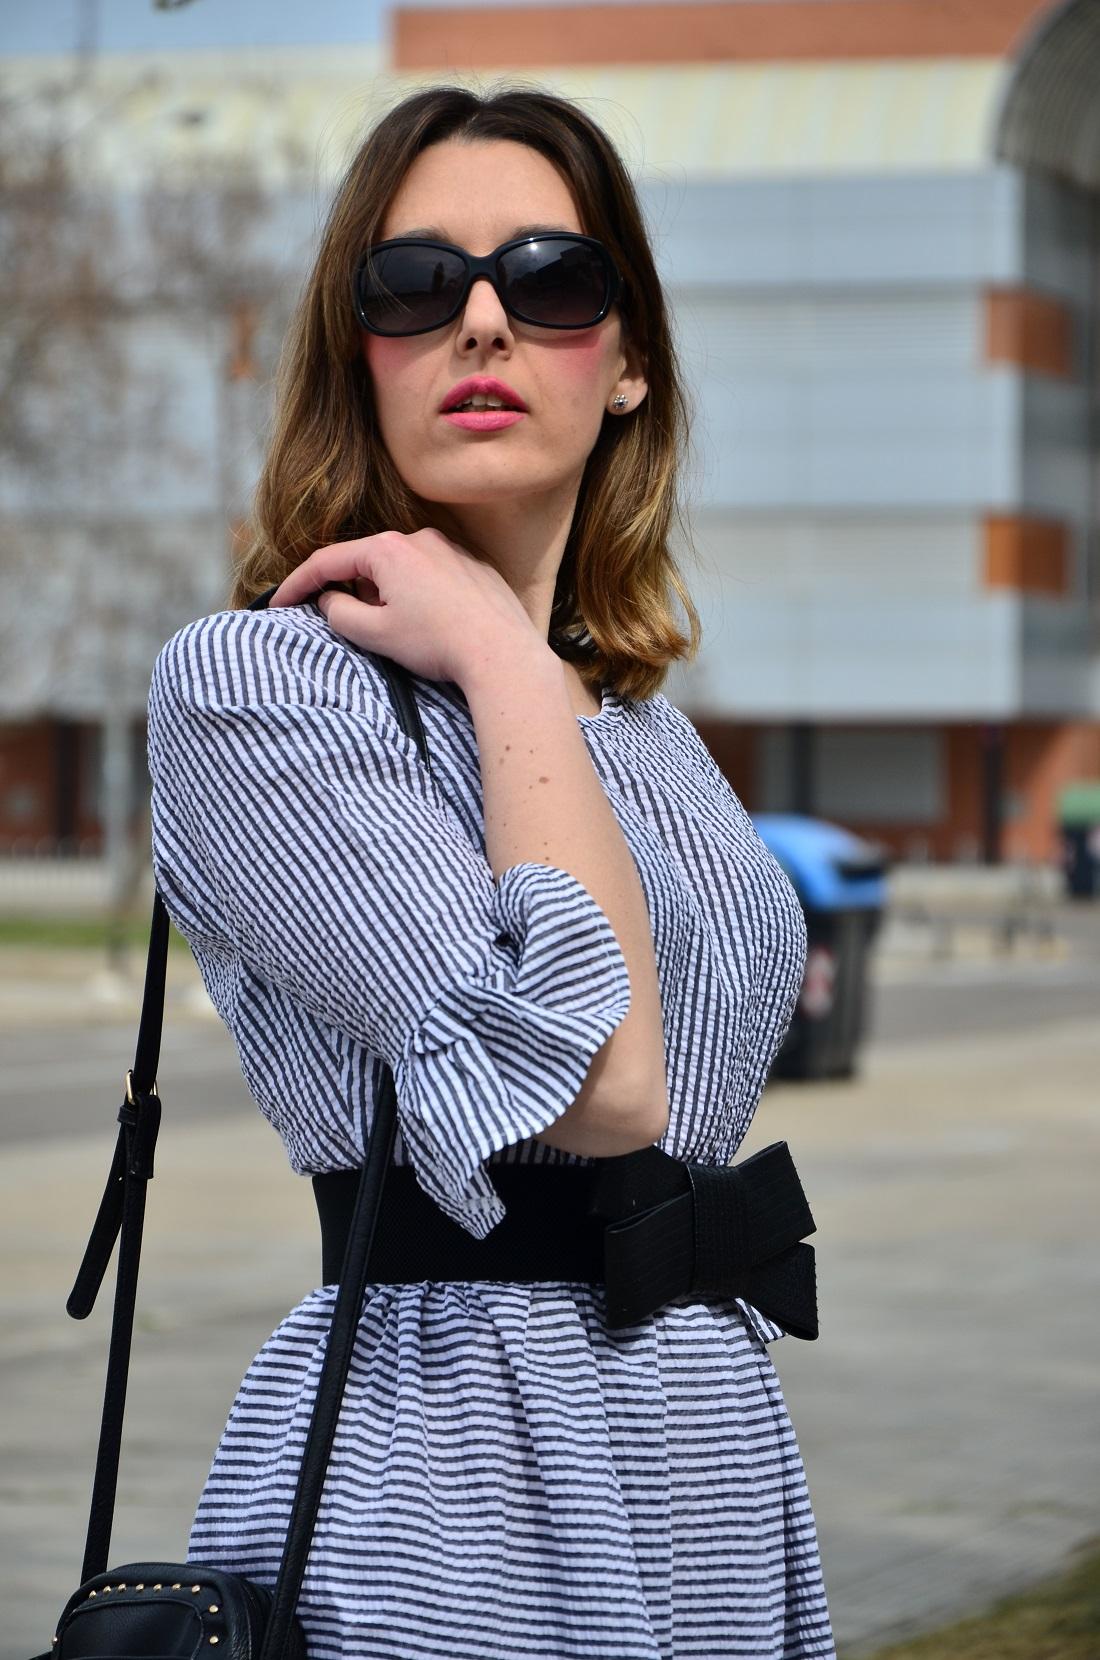 stripesdress-8